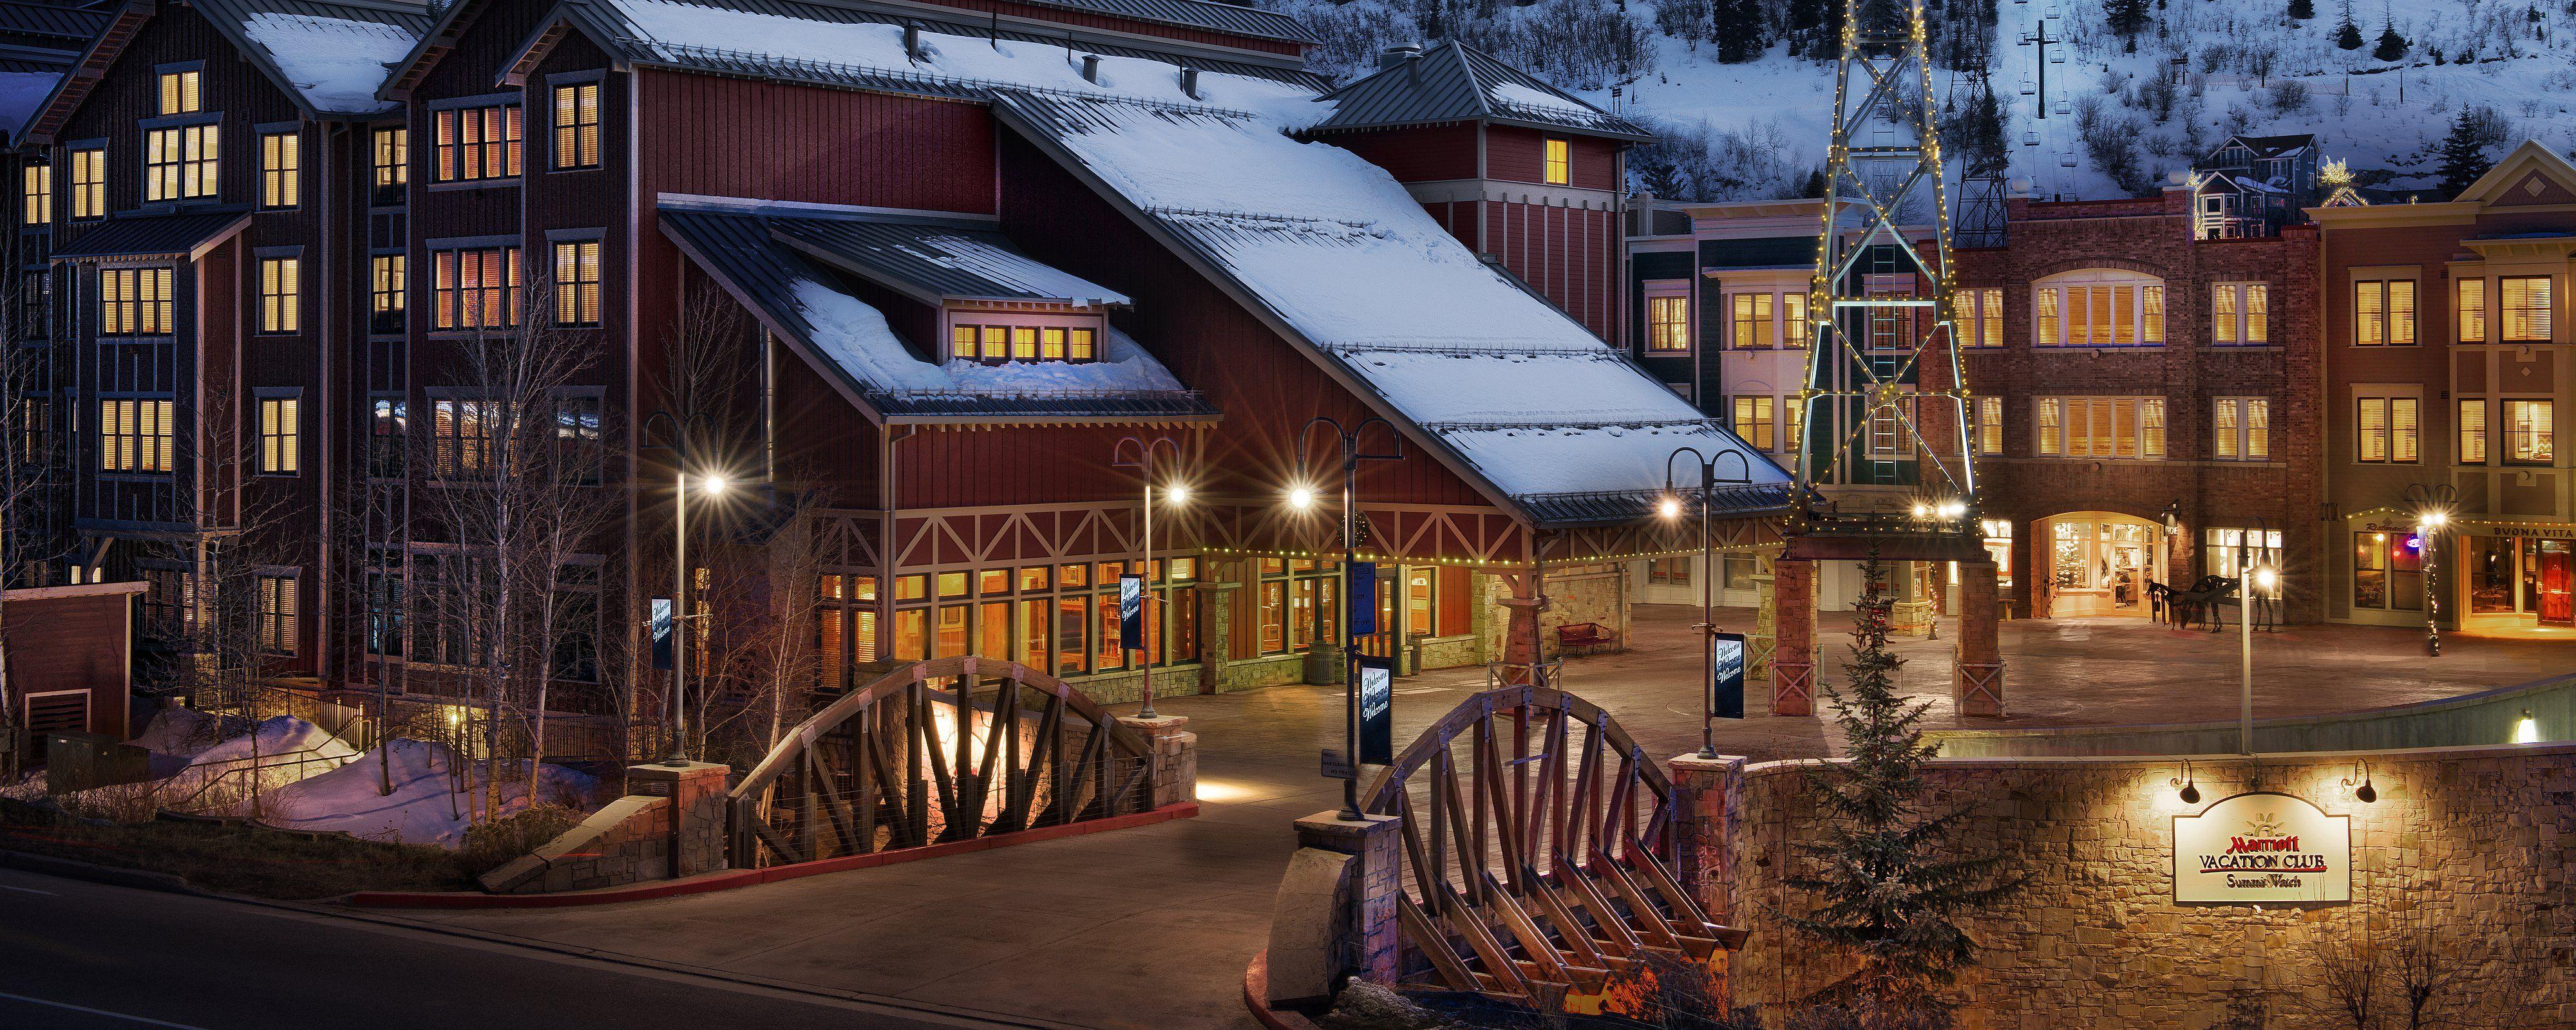 Marriott S Summit Watch Benefits From A Wonderful Location In Park